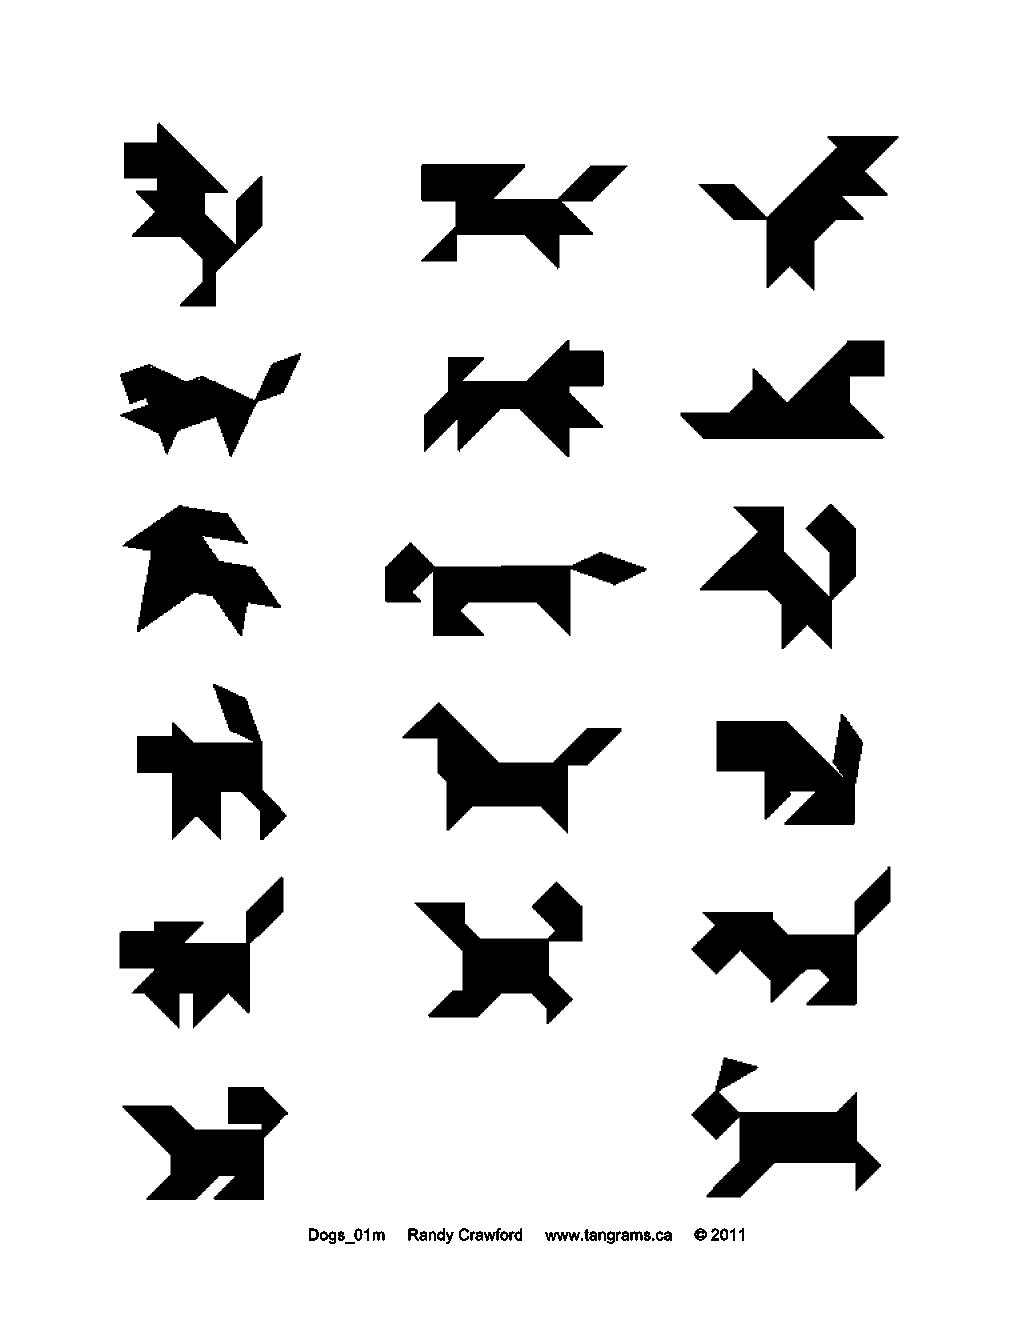 TANGRAM DOGS | Tangrams.ca - History - Make - Puzzles - Downloads ...